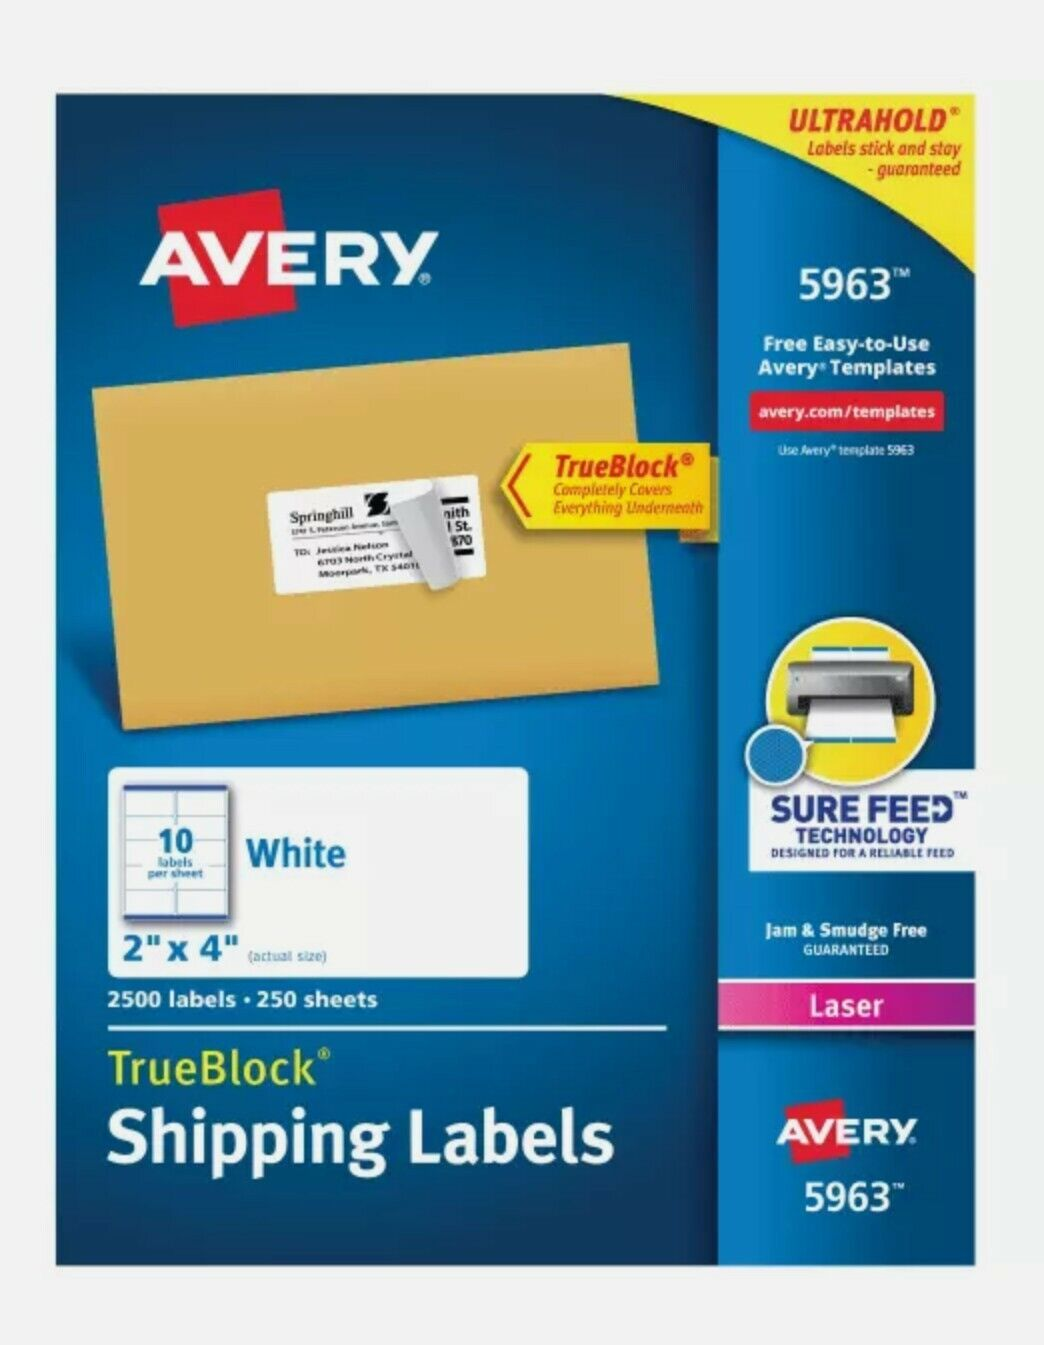 Avery 5963 Template : avery, template, Avery, Labels, TrueBlock, Technology, Laser, White, 2500/box, Ave5963, Online